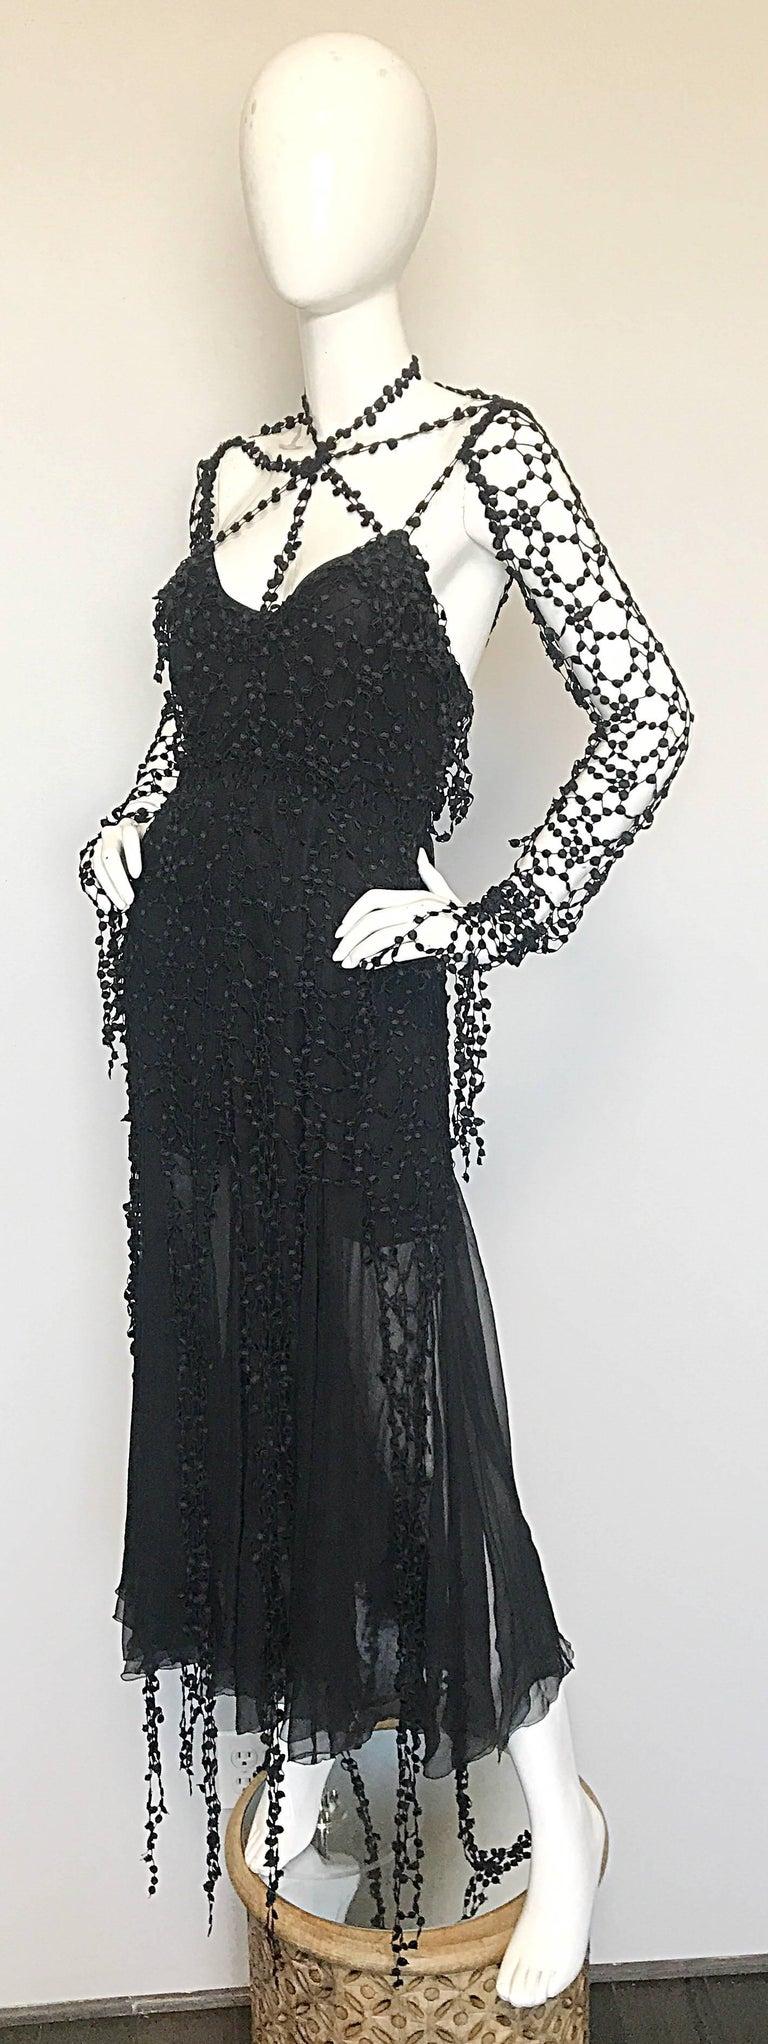 1990s Karl Lagerfeld Vintage ' Spiderweb ' Black Silk Chiffon Vintage 90s Dress For Sale 1